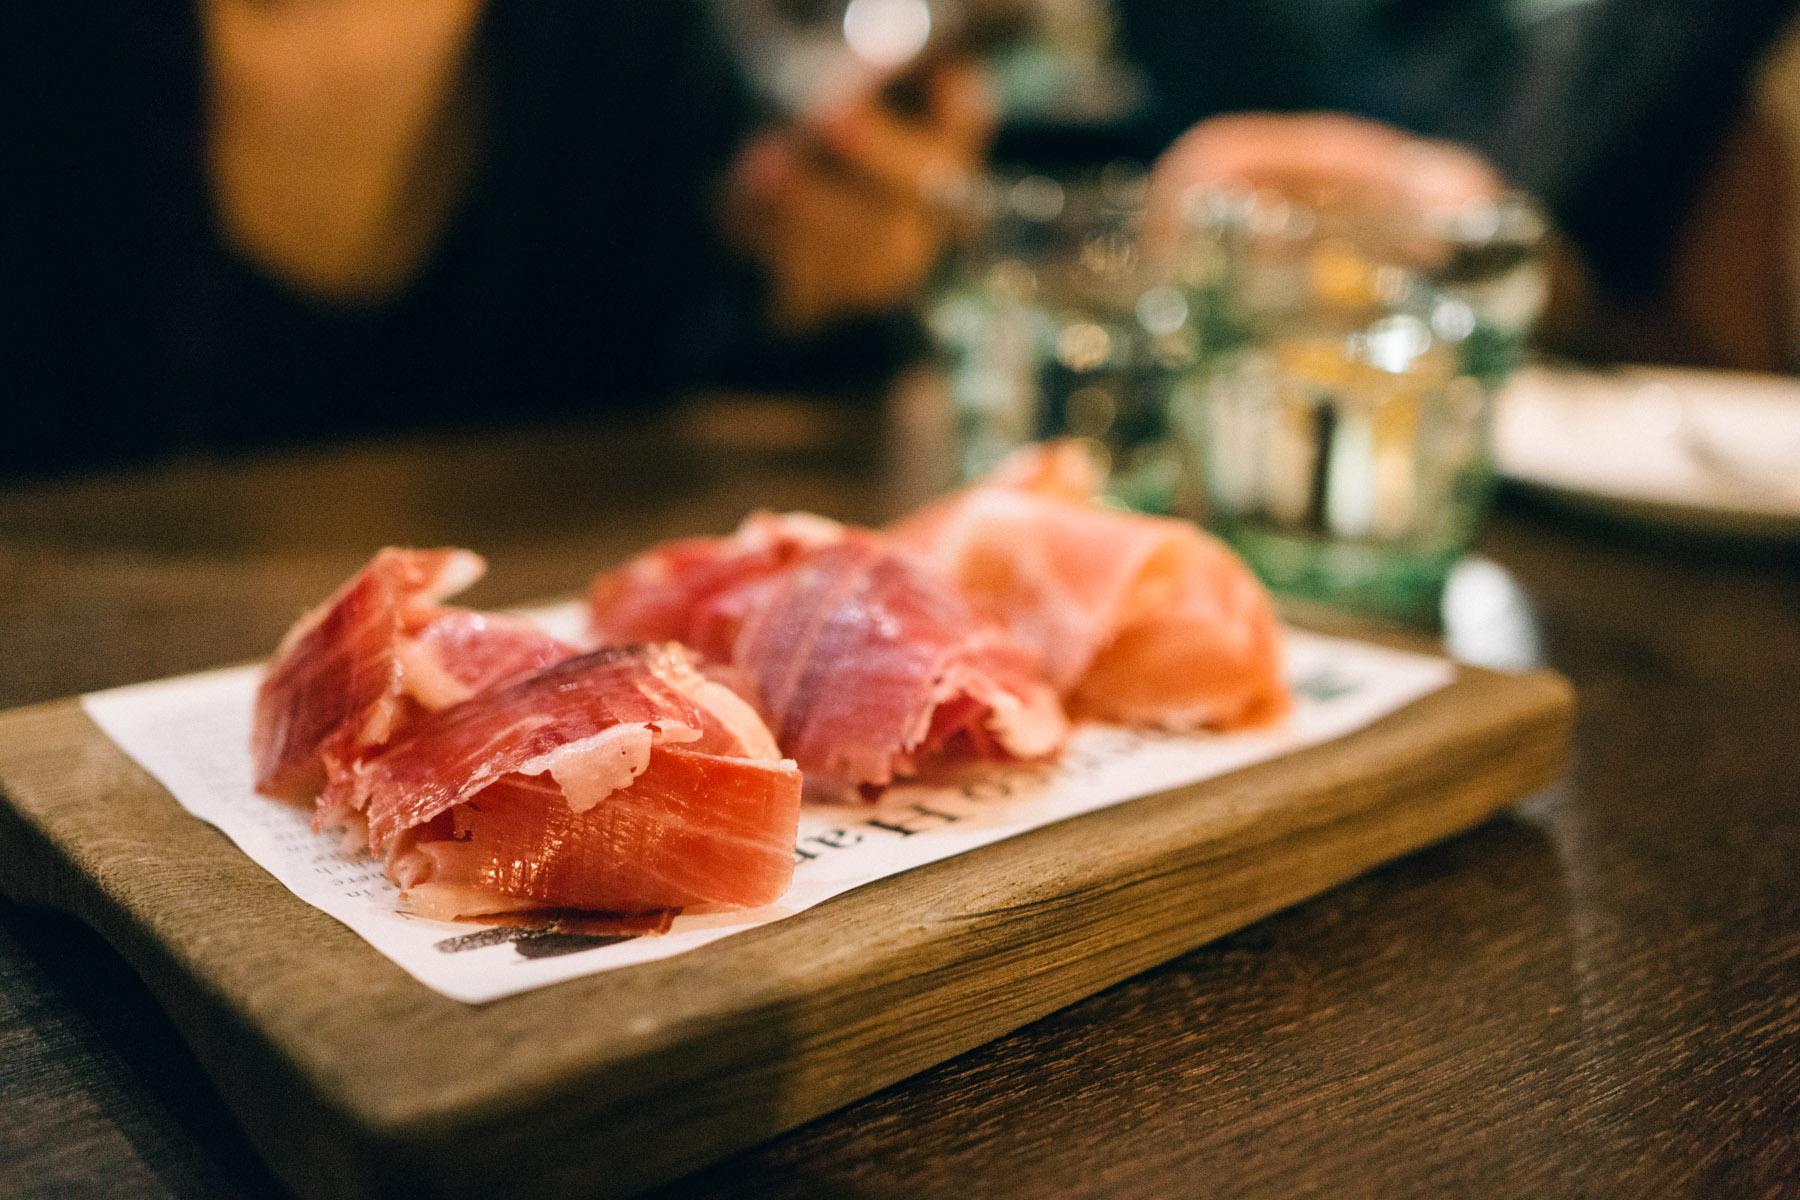 ham-and-sherry-spanish-tapas-ship-street-wan-chai-hong-kong-jason-atherton-7